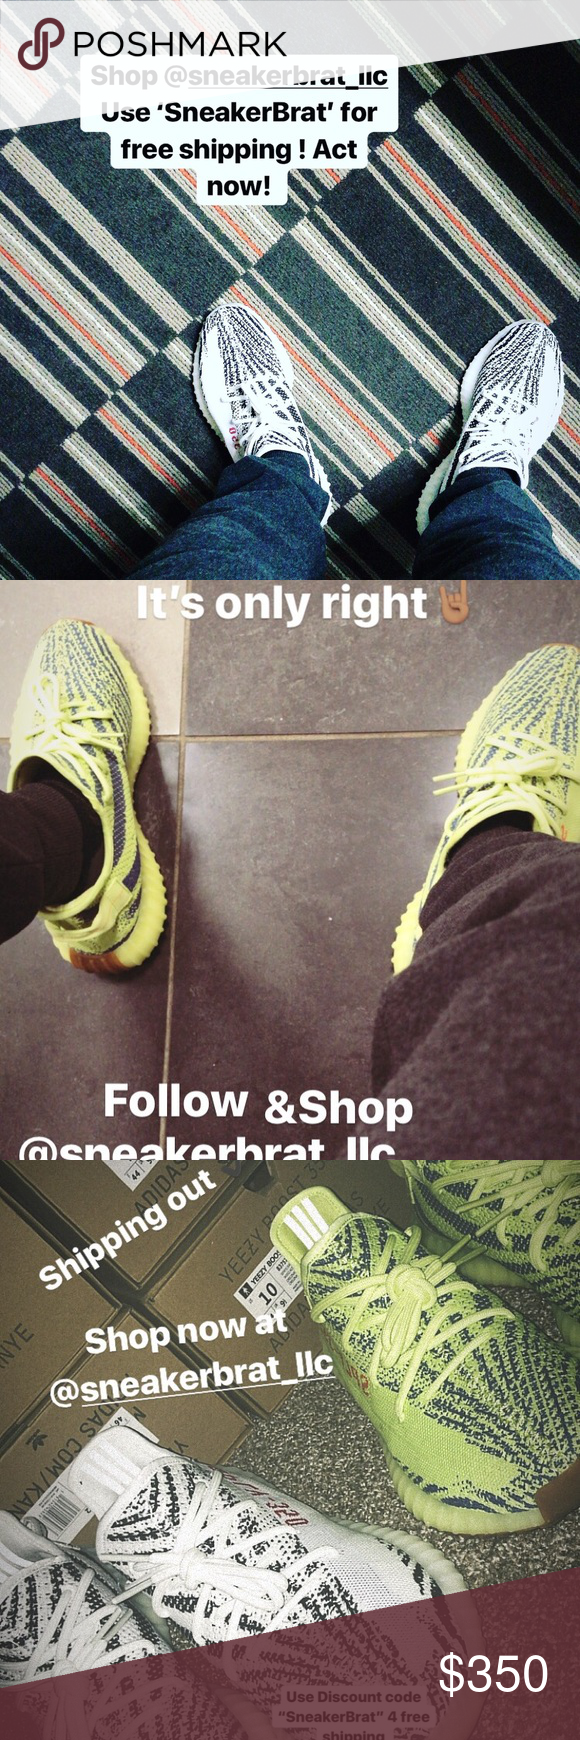 yeezy boost 950 sale net adidas yeezy boost 350 v2 zebra raffle